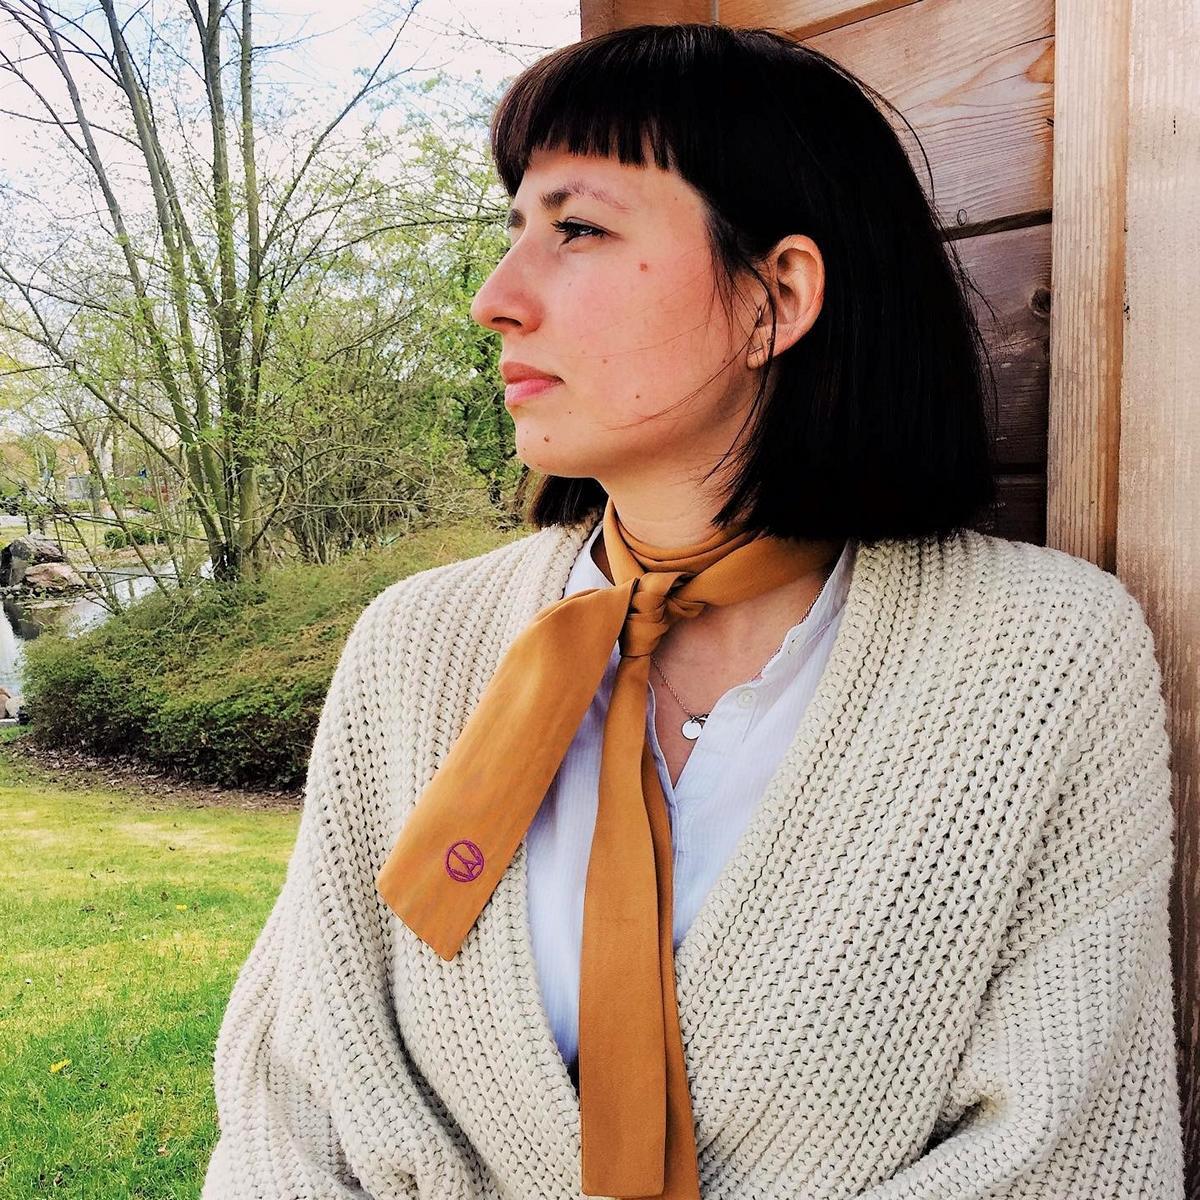 Style Hannover Wayom Lorena Winkler - Lorena Winkler: Die Macherin von WAYÓM